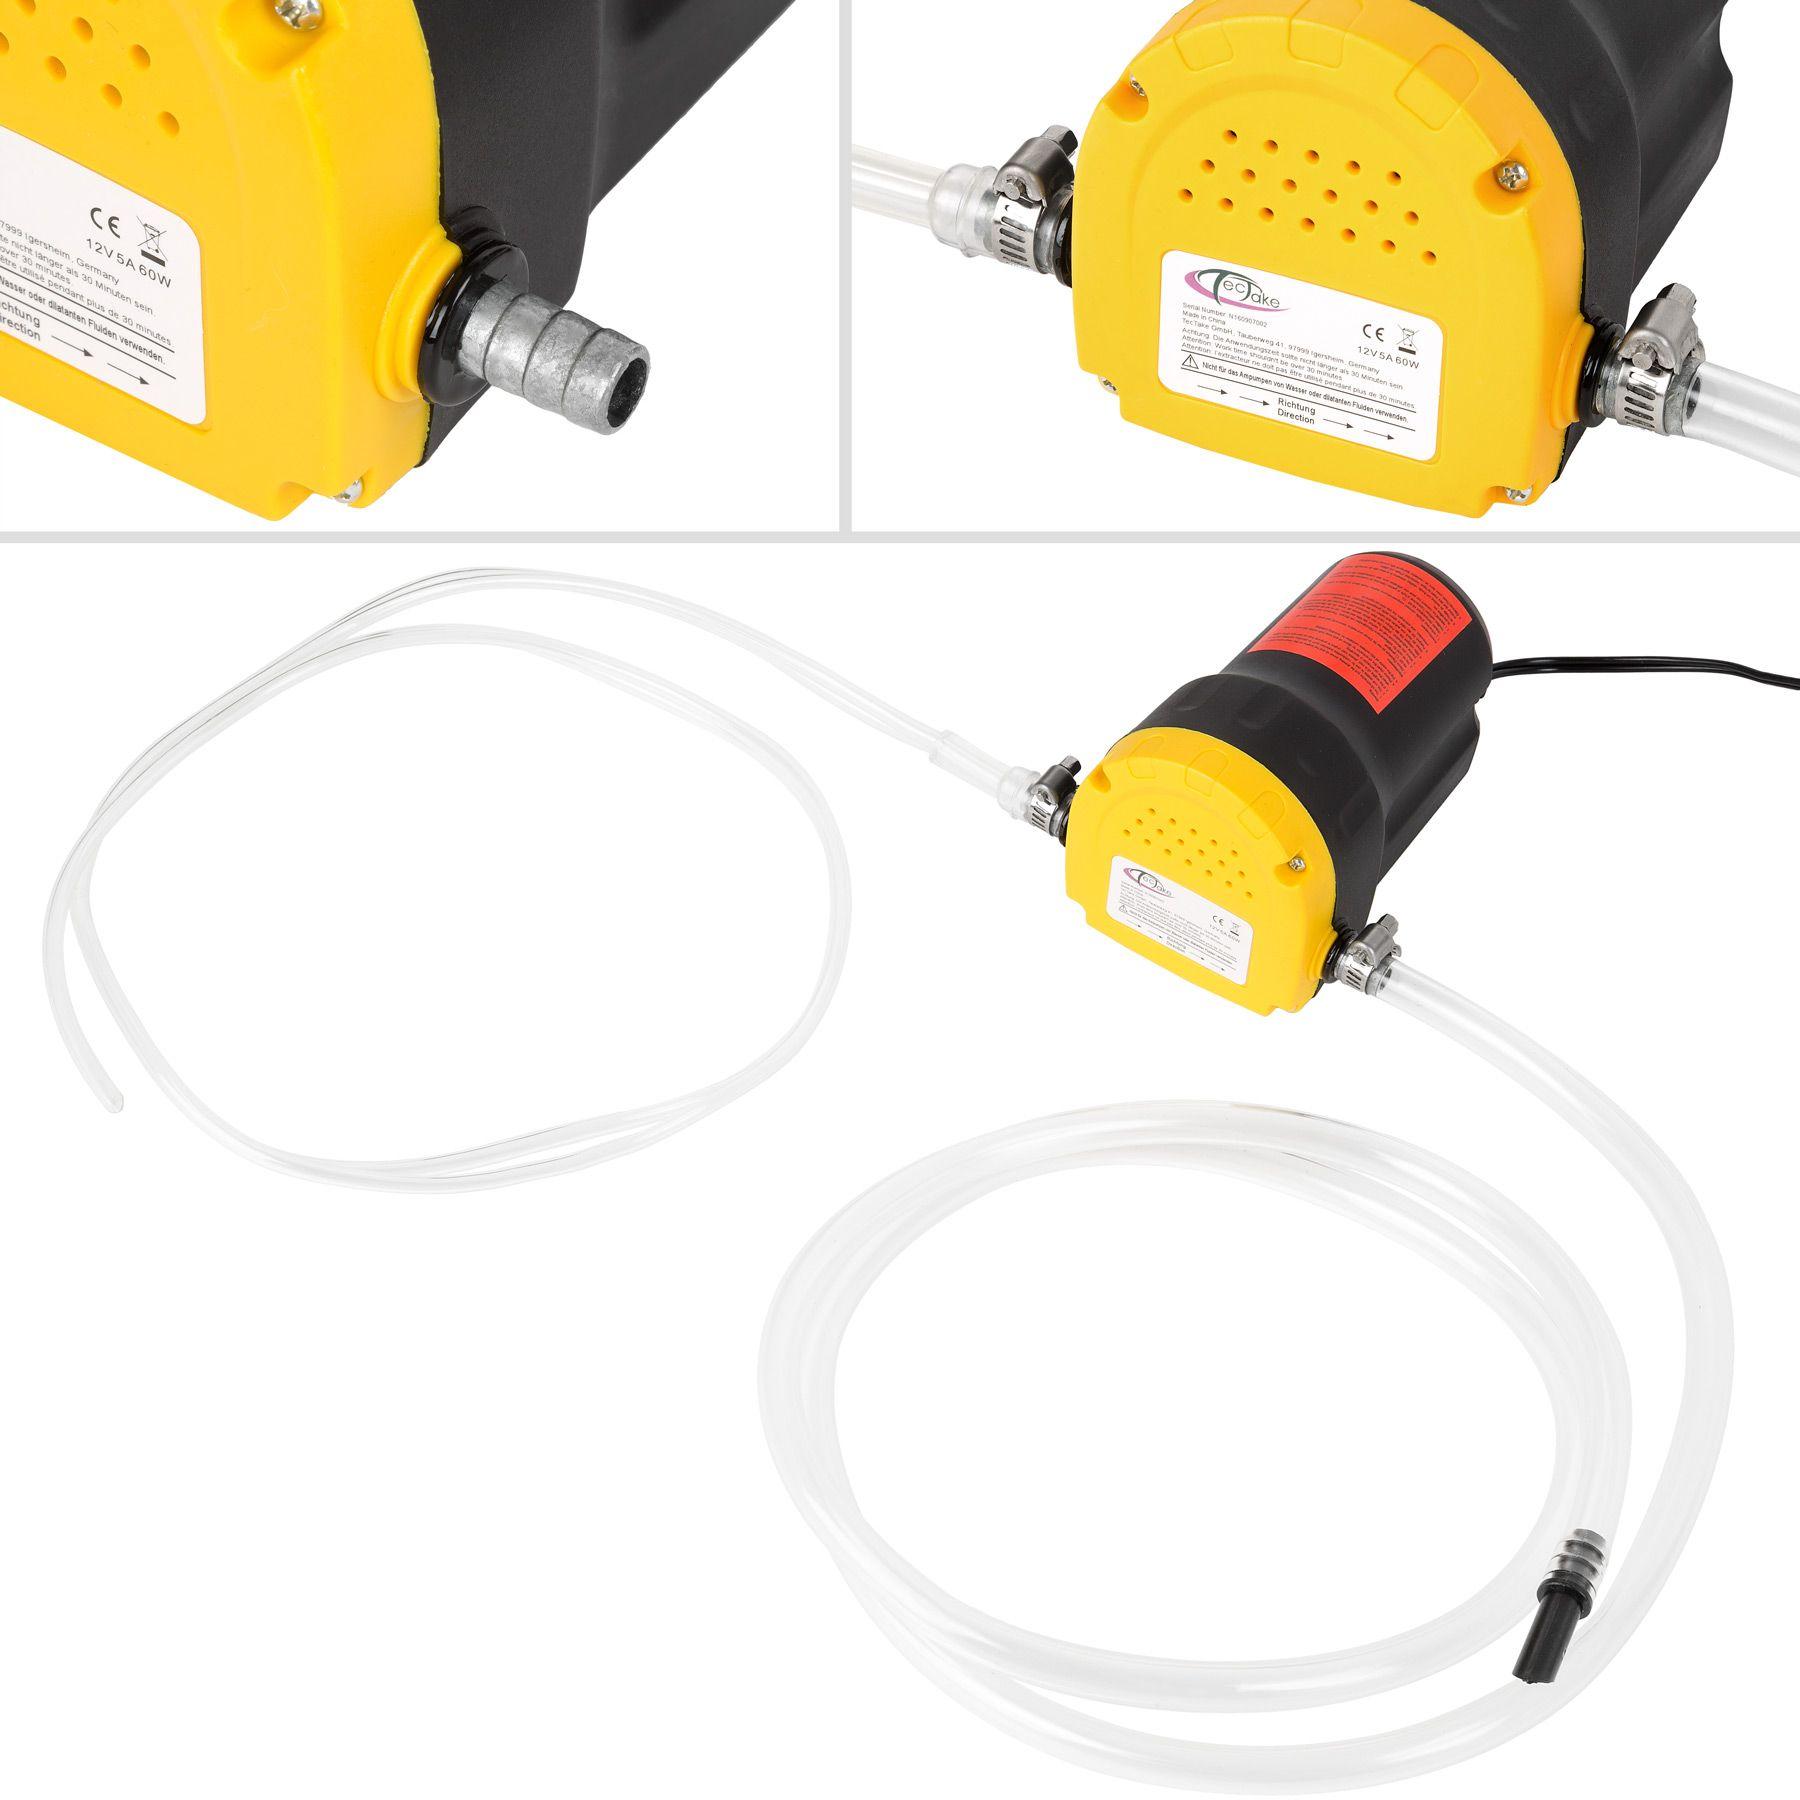 Ölpumpe Ölabsaugpumpe 12V Motoröl Ölwechsel Absaugpumpe Dieselpumpe 60 W Top